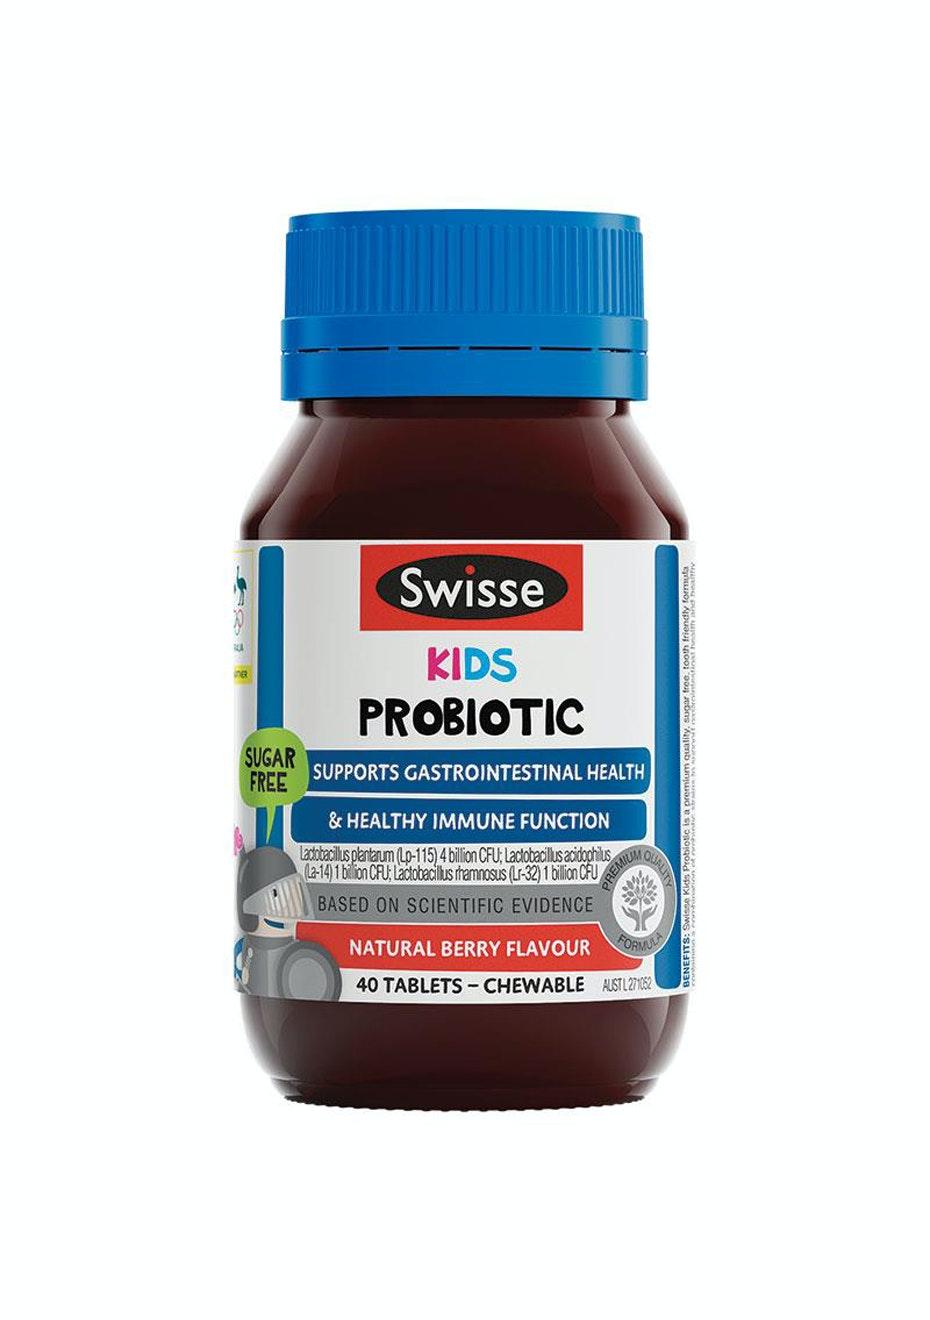 Swisse Kids Probiotic 40 Chewable Tablets